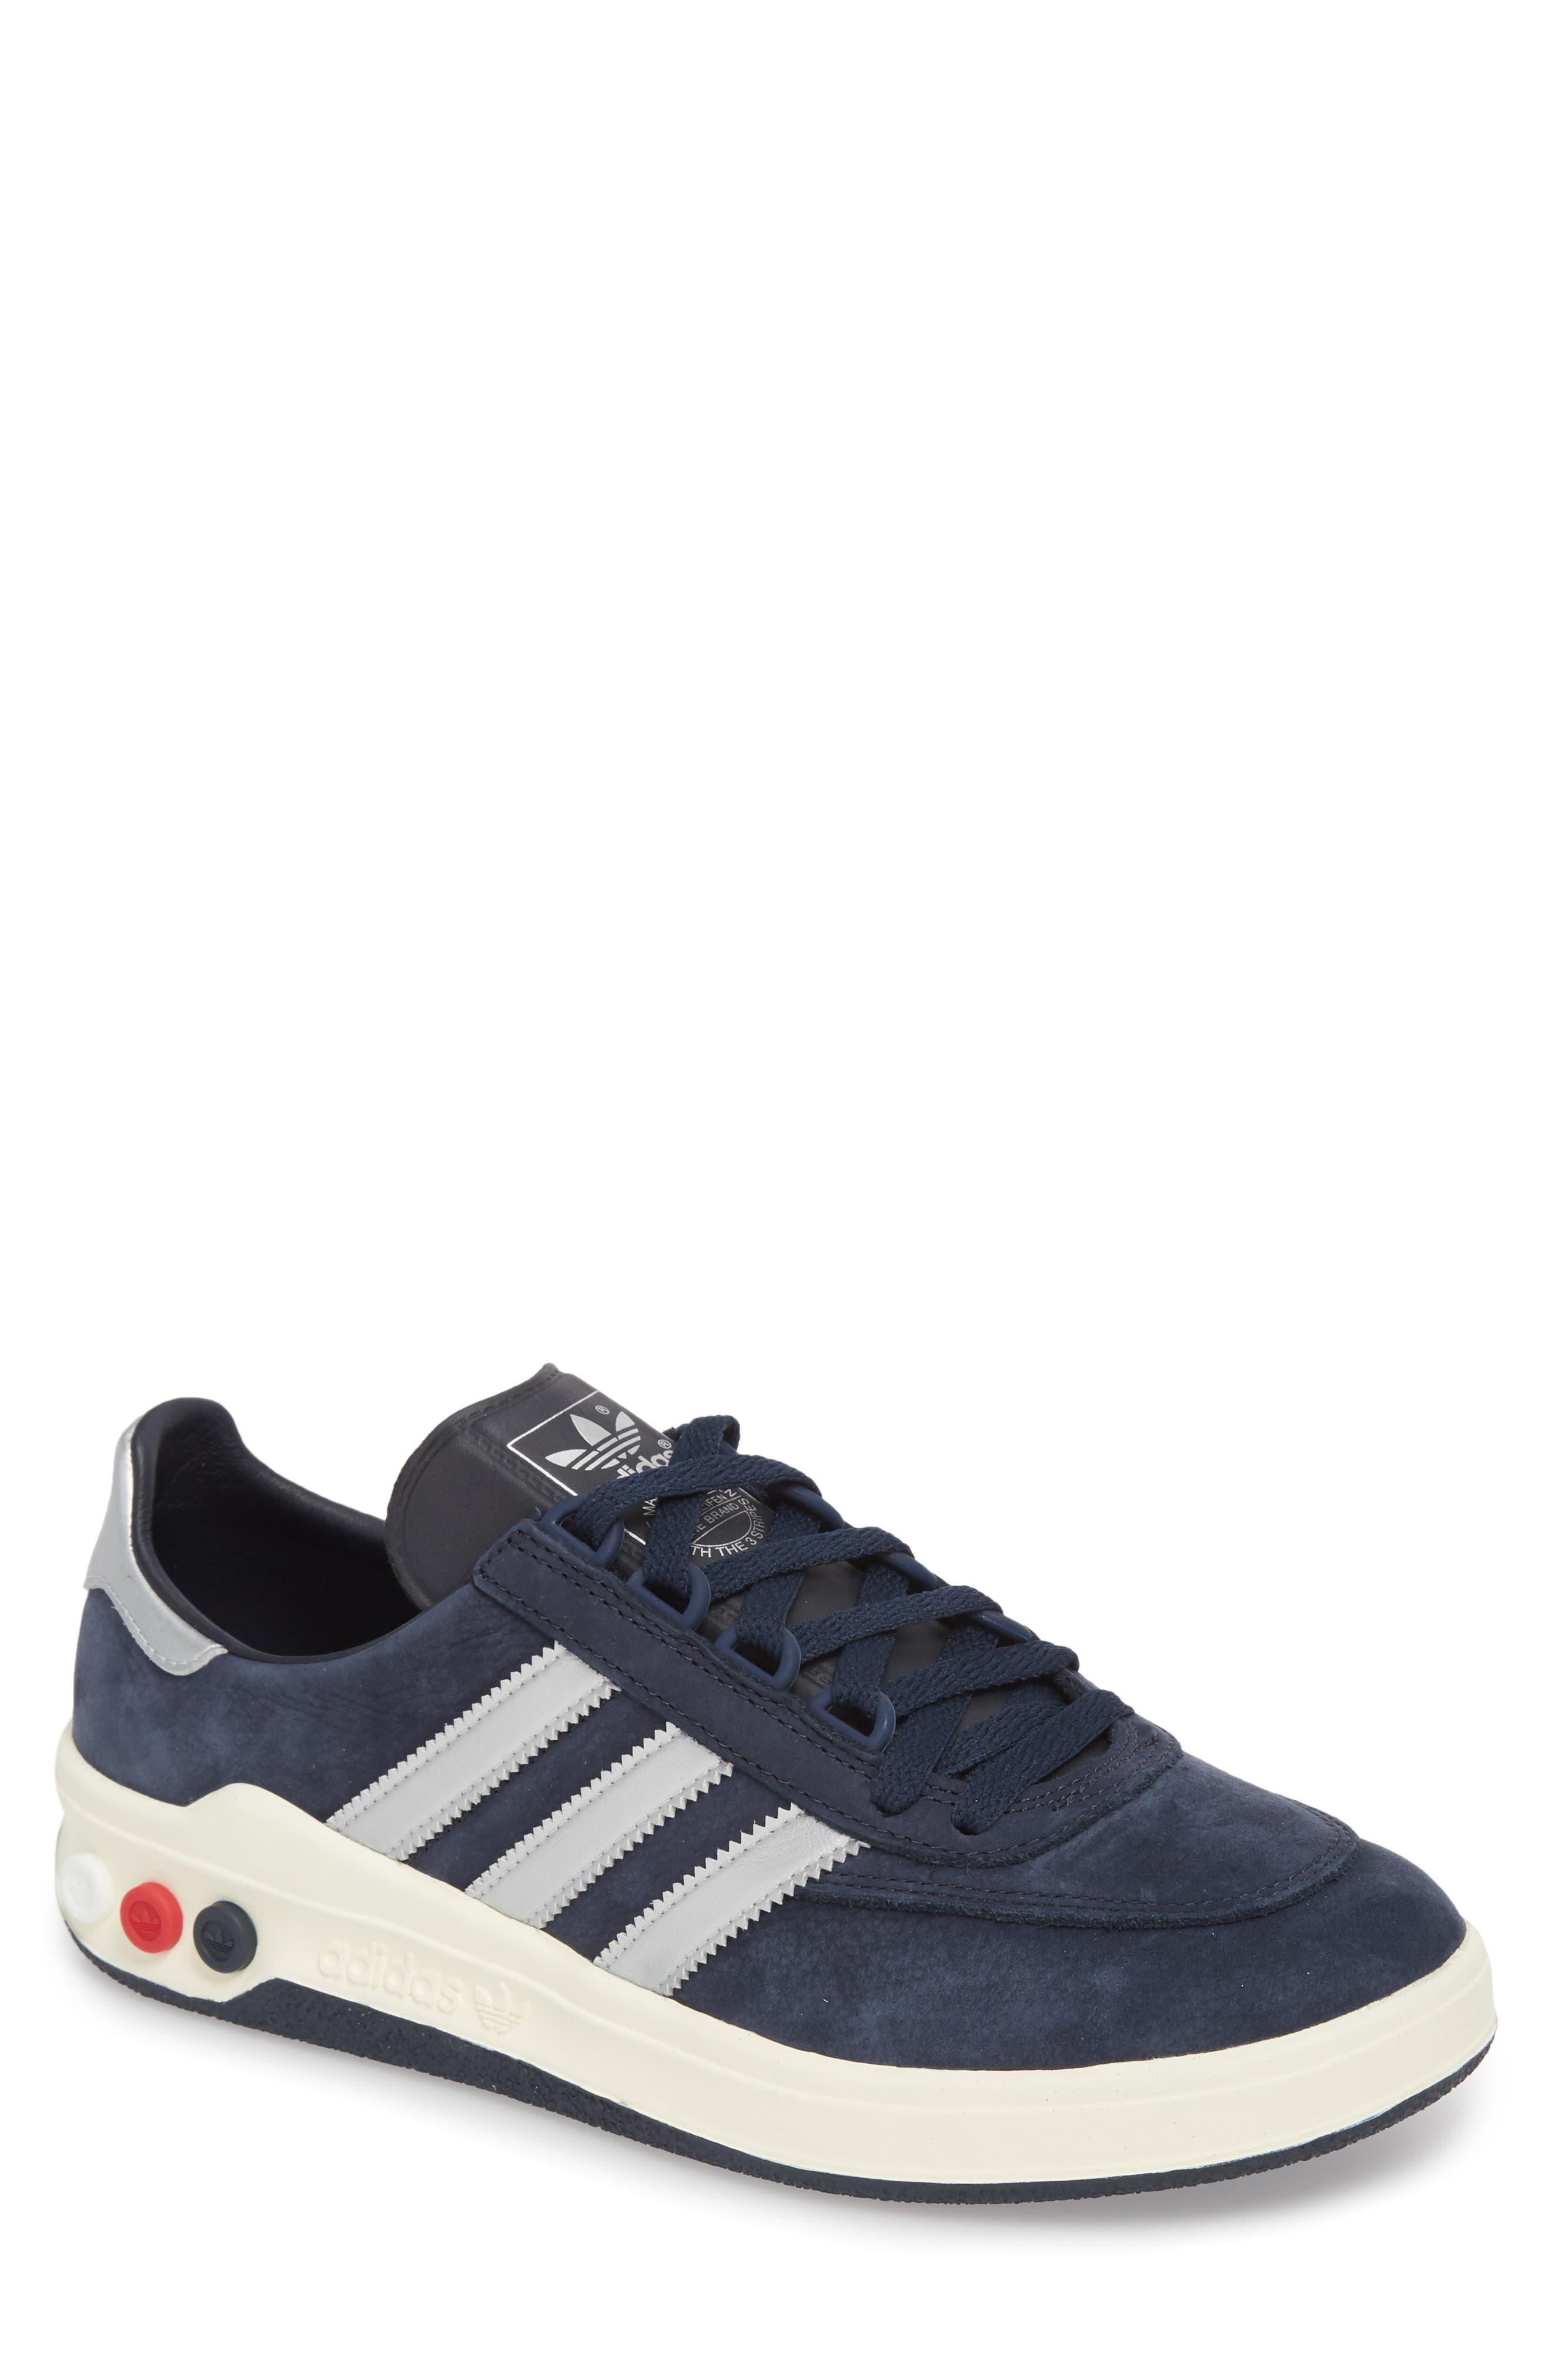 CLMBA SPZL Sneaker,                             Main thumbnail 1, color,                             Night Navy/ Silver/ White